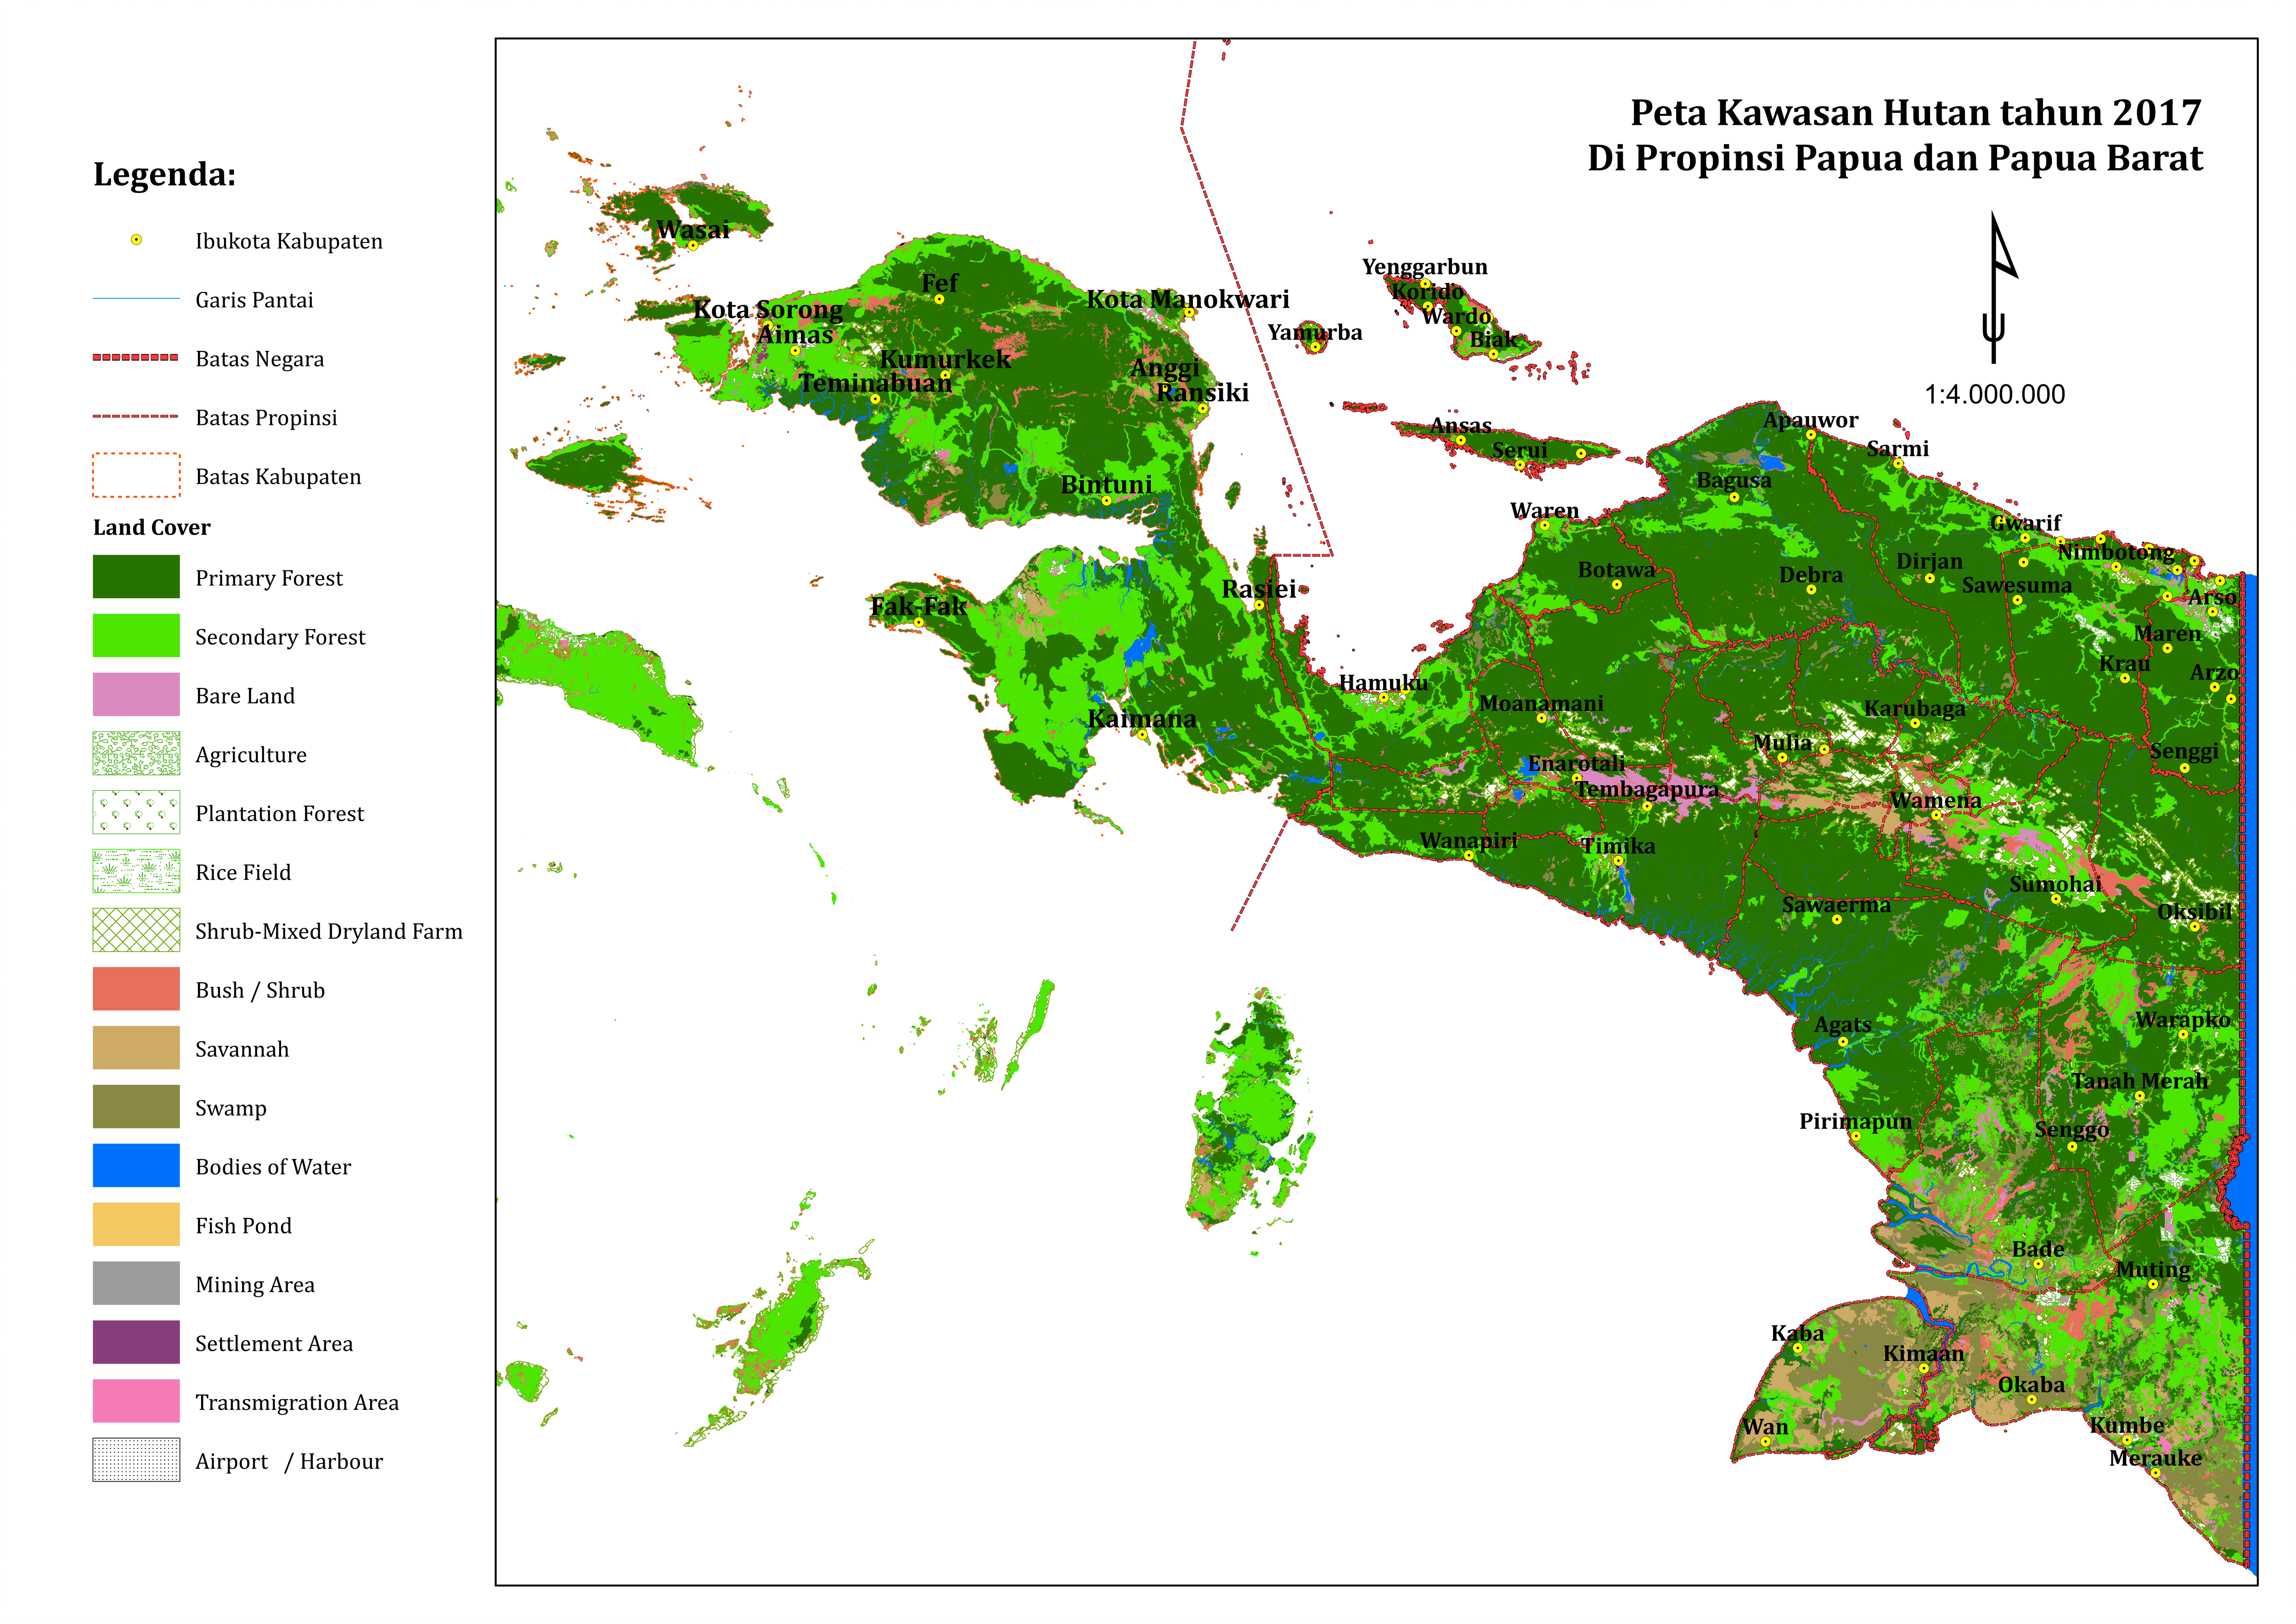 Pantau Deforestasi Tanah Papua Lewat Atlas Papua Pantai Peta Hutan